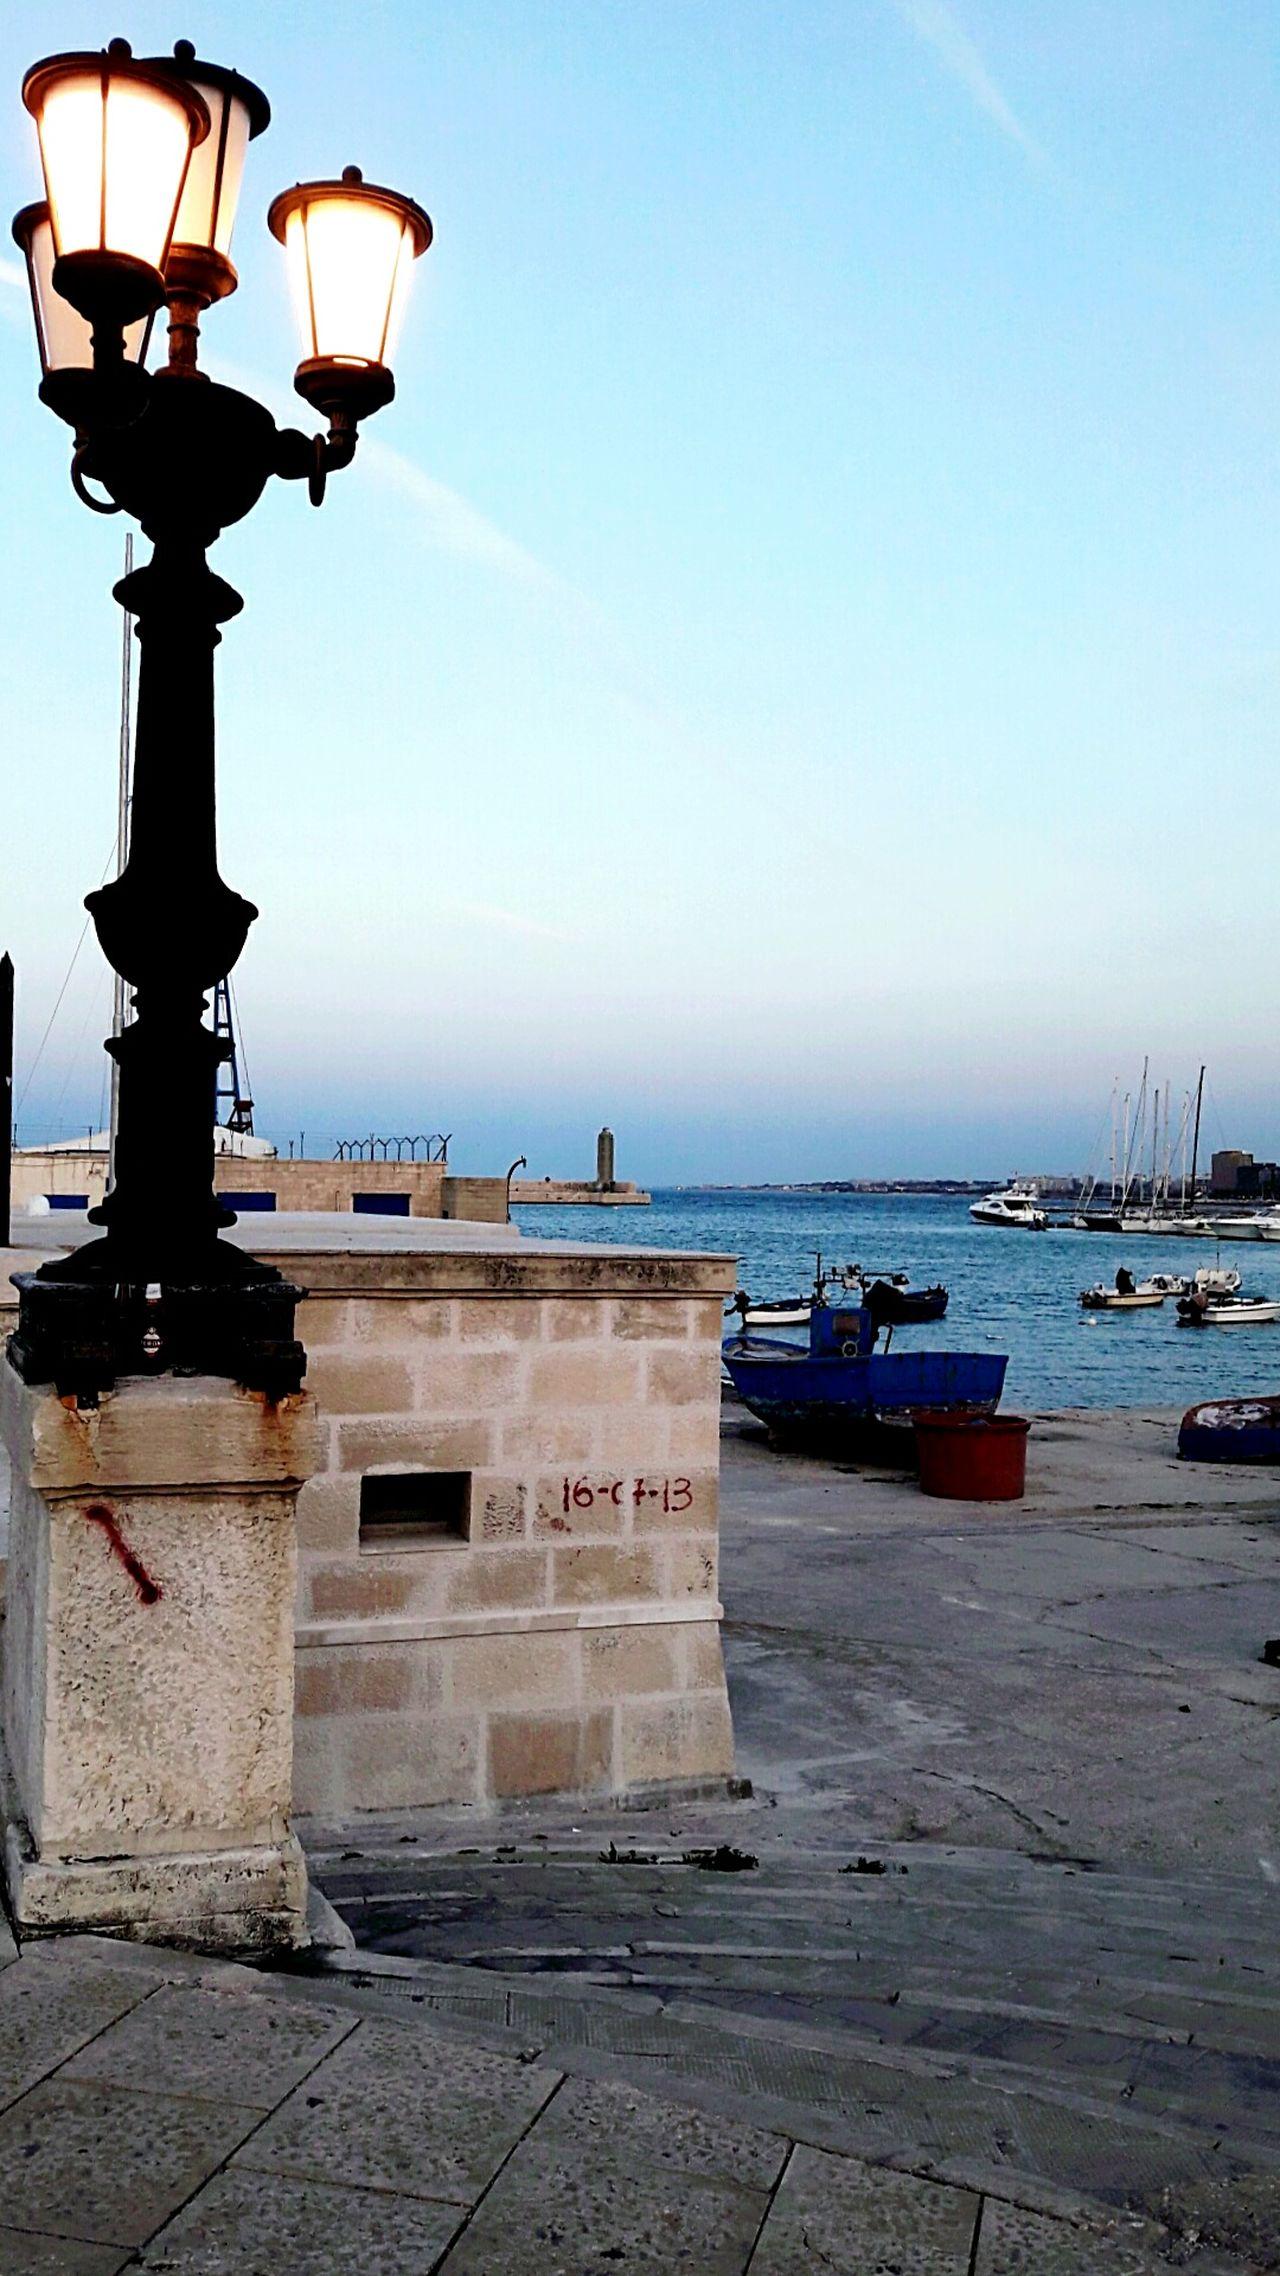 Sea Sky City No People Outdoors Day Beauty In Nature Photography Puglia City Bari Landscape Italy Street Light